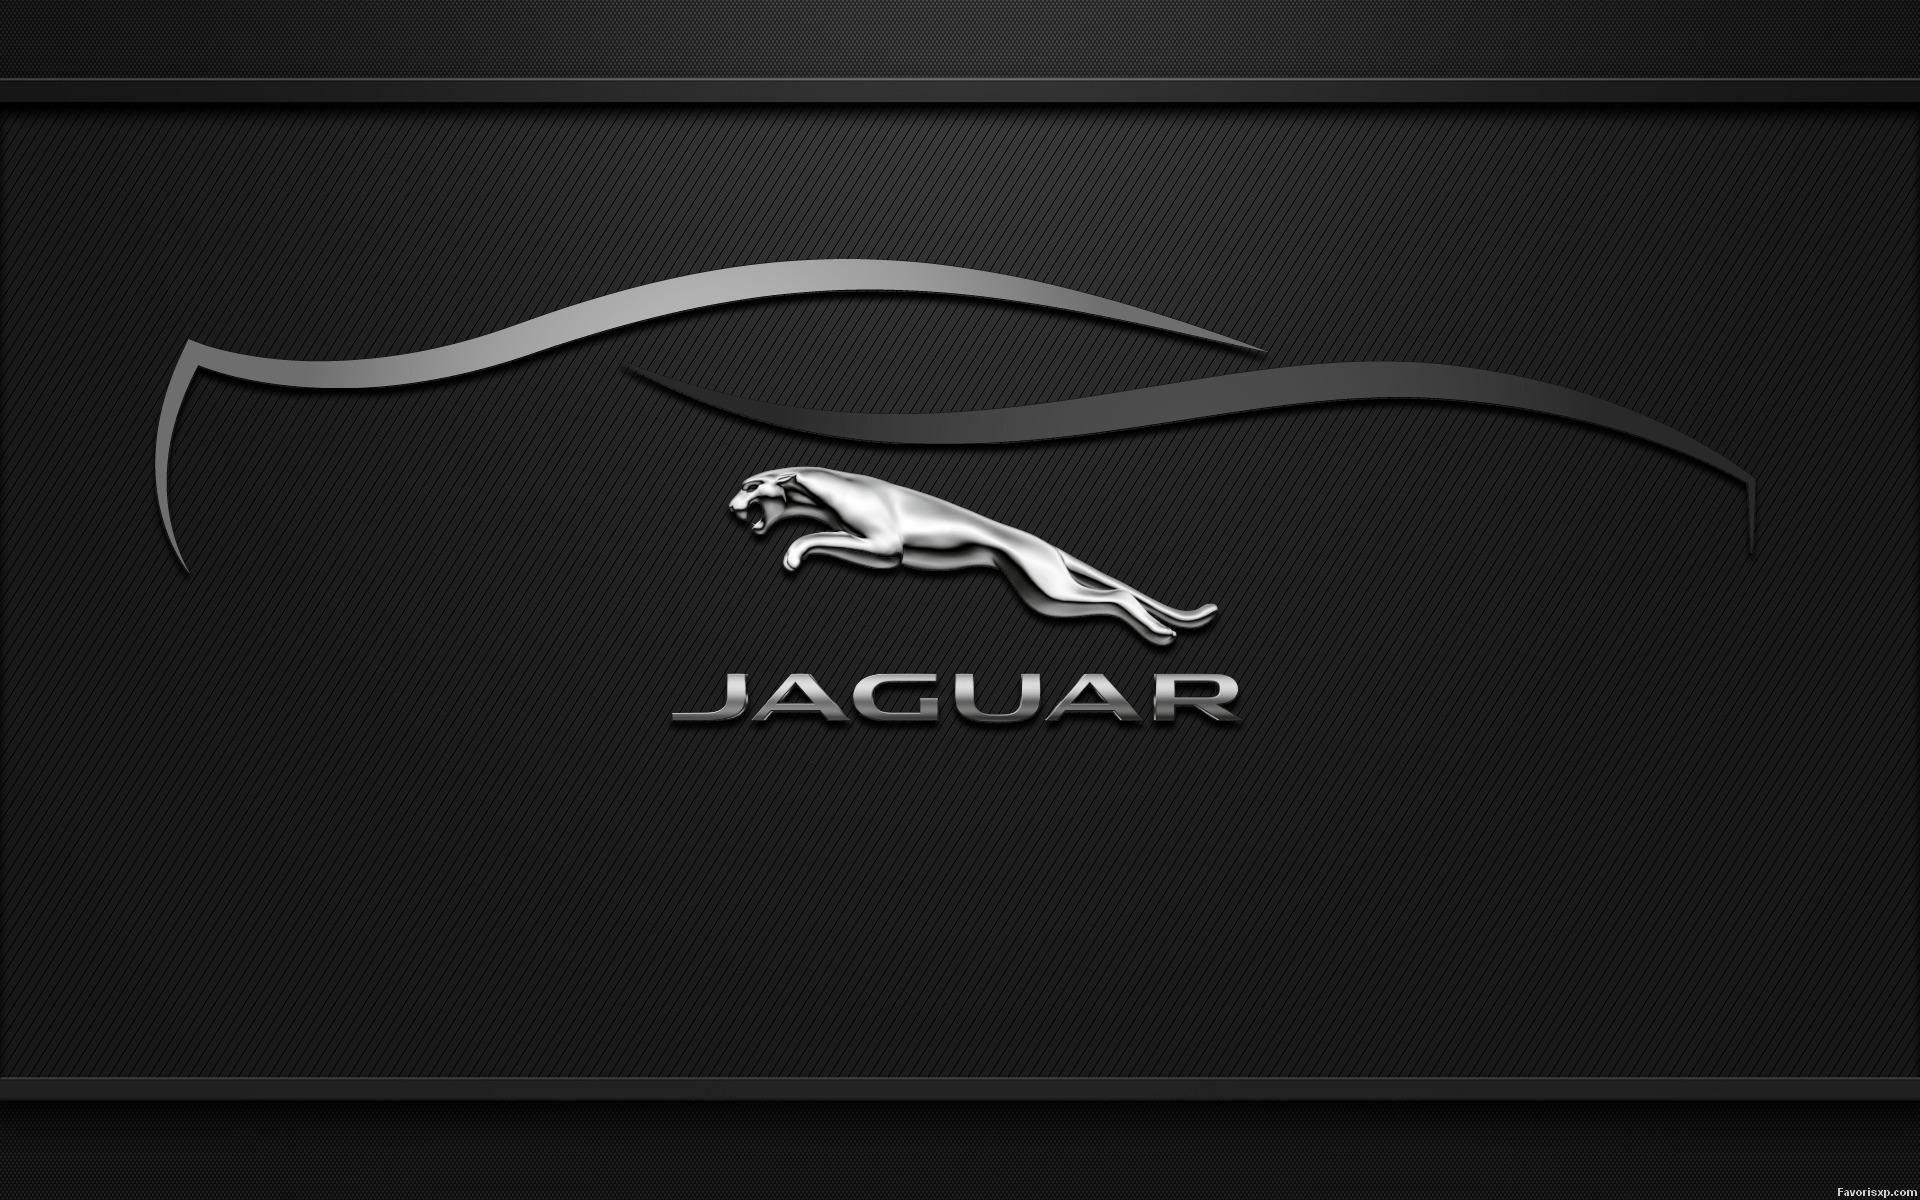 logo marque voiture de prestige jaguar lamborghini bentley maserati aston martin en. Black Bedroom Furniture Sets. Home Design Ideas